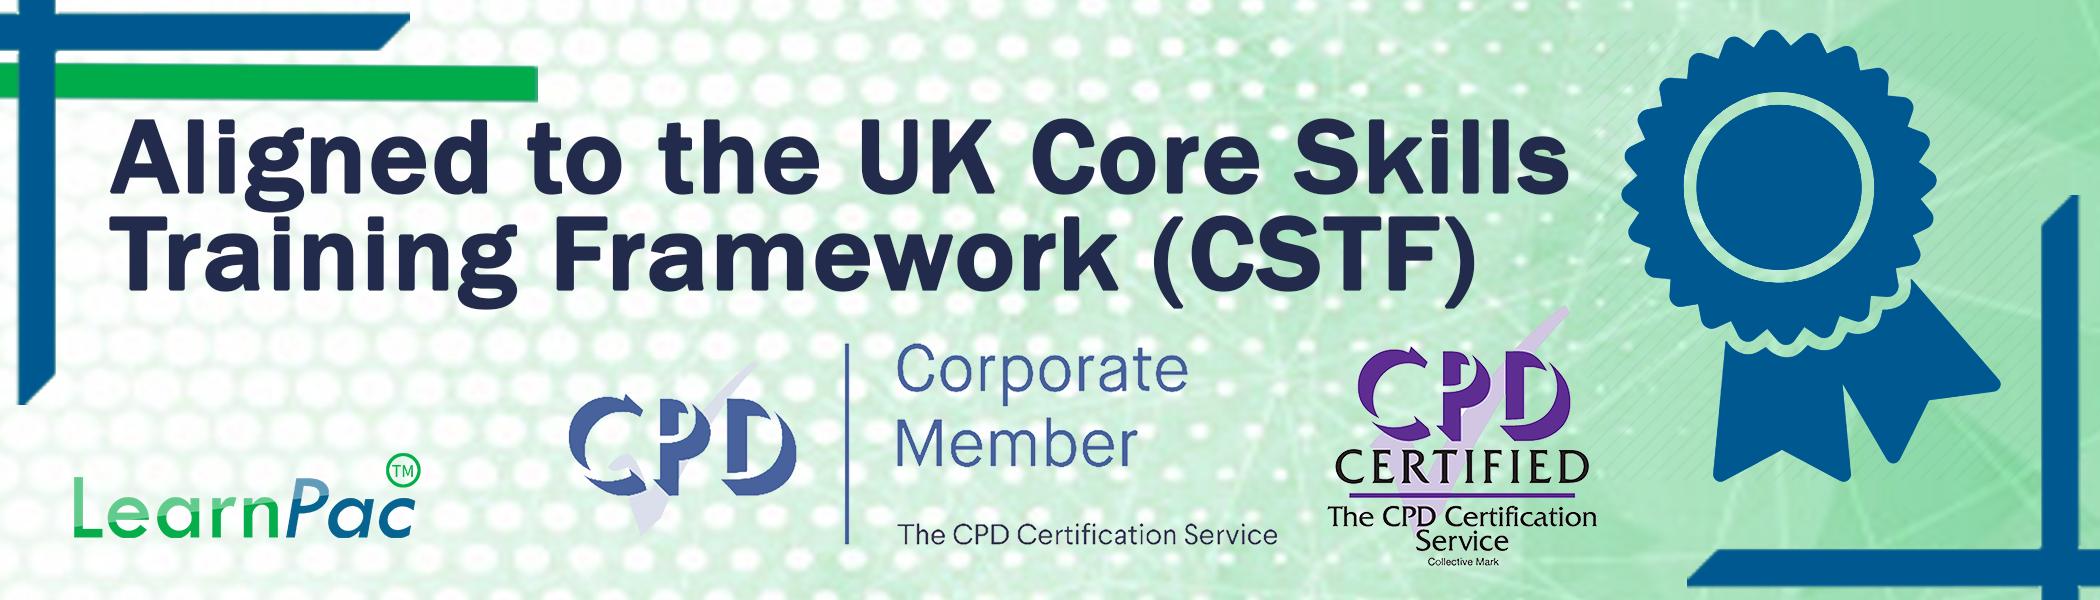 CSTF Newborn Life Support - Resuscitation - Online Learning Courses - E-Learning Courses - LearnPac Systems UK -